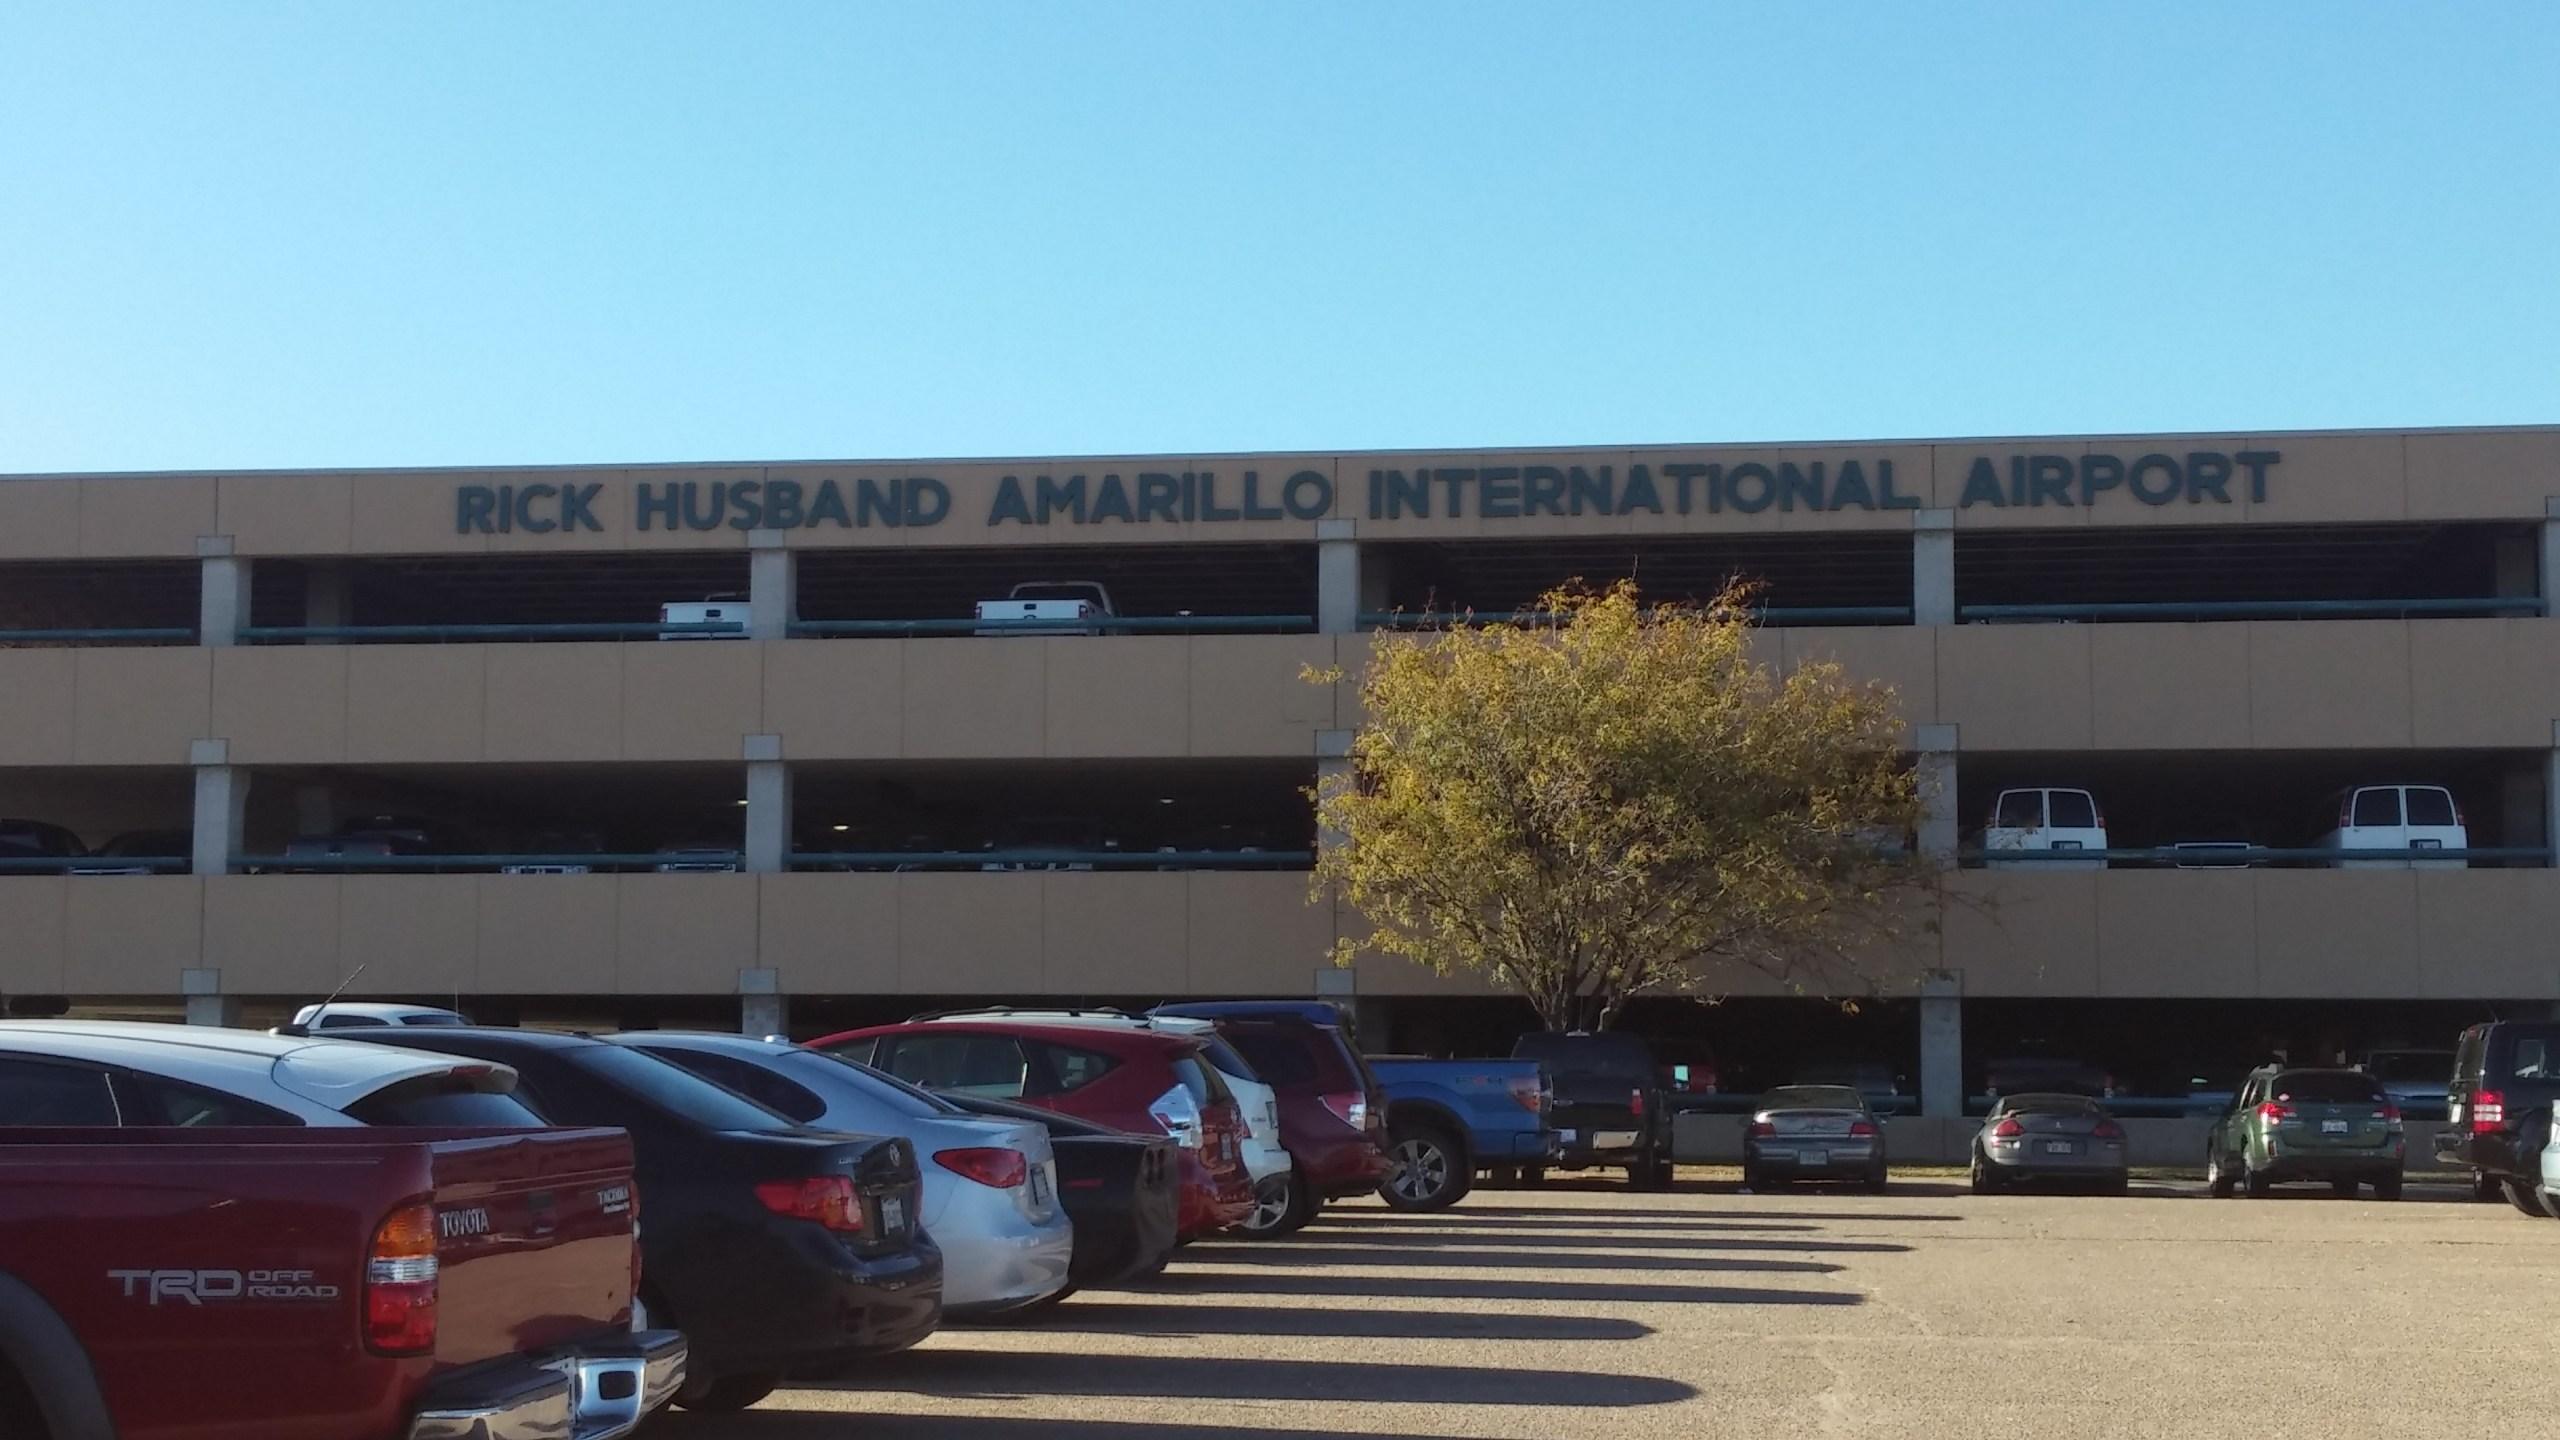 Rick Husband Amarillo International Airport to host TSA Pre-Check